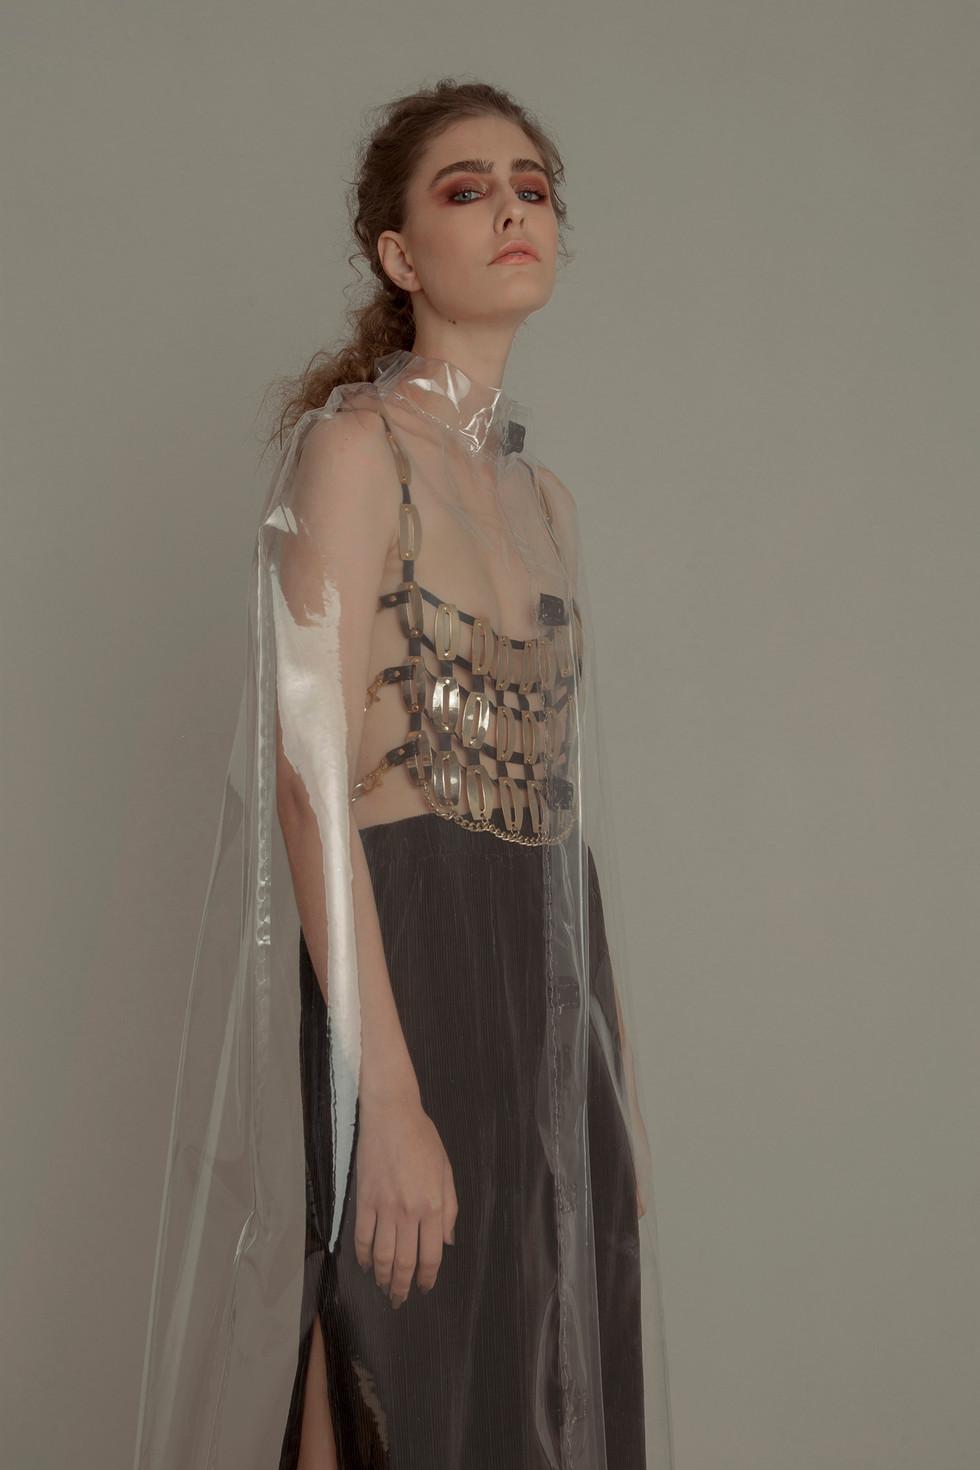 EDITORIAL. LISA by Joel Beraldi on Fashion Grunge